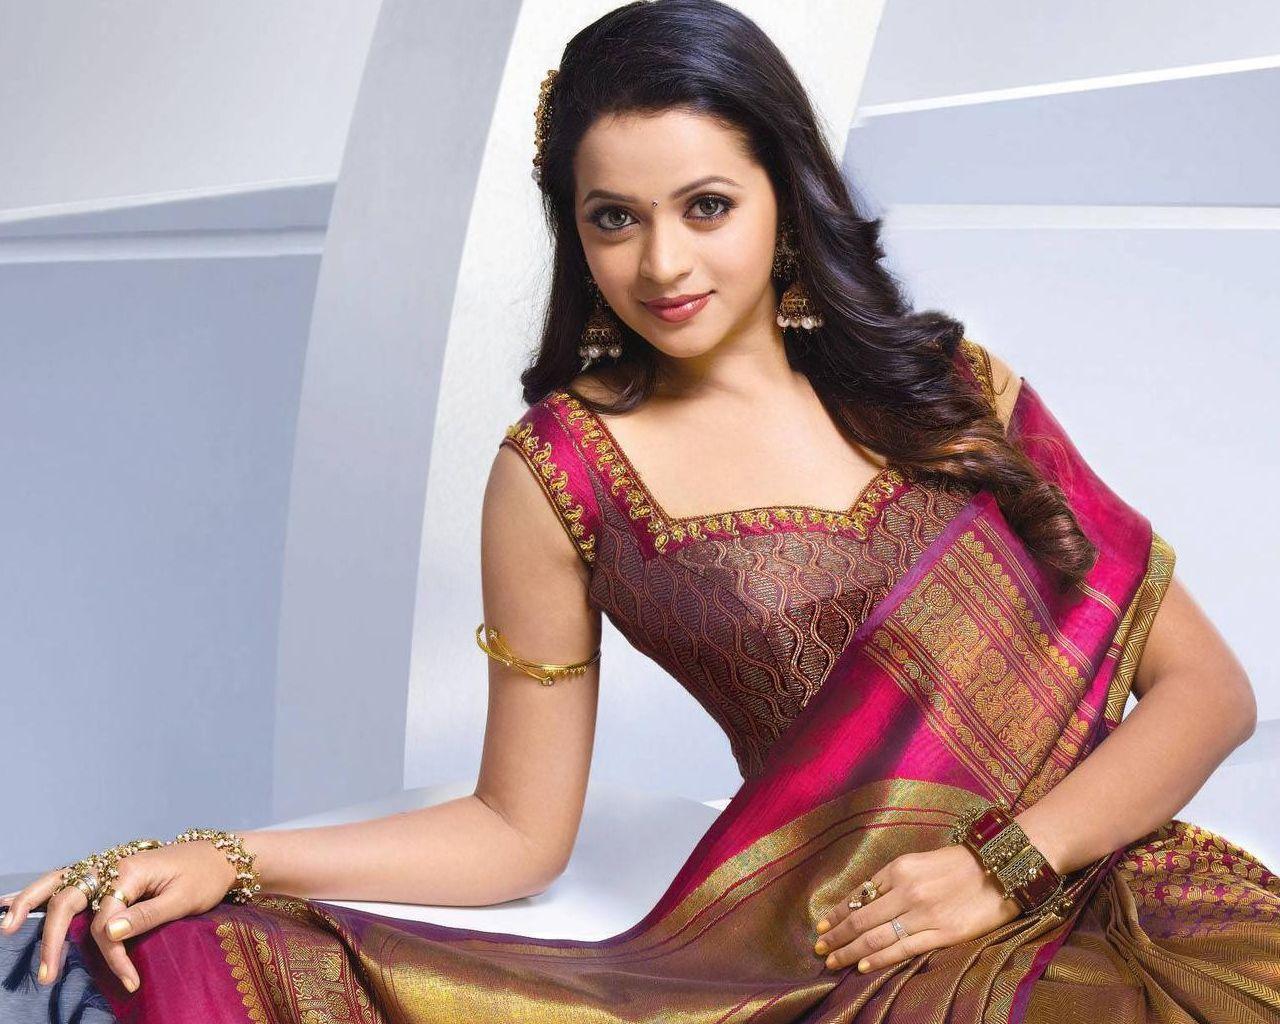 Beautiful actress bhavana httpnicewallpaperswallpaper bhavana in silky brown and red dress hd desktop wallpaper more wallpaper of bhavana at english wallpapers altavistaventures Image collections